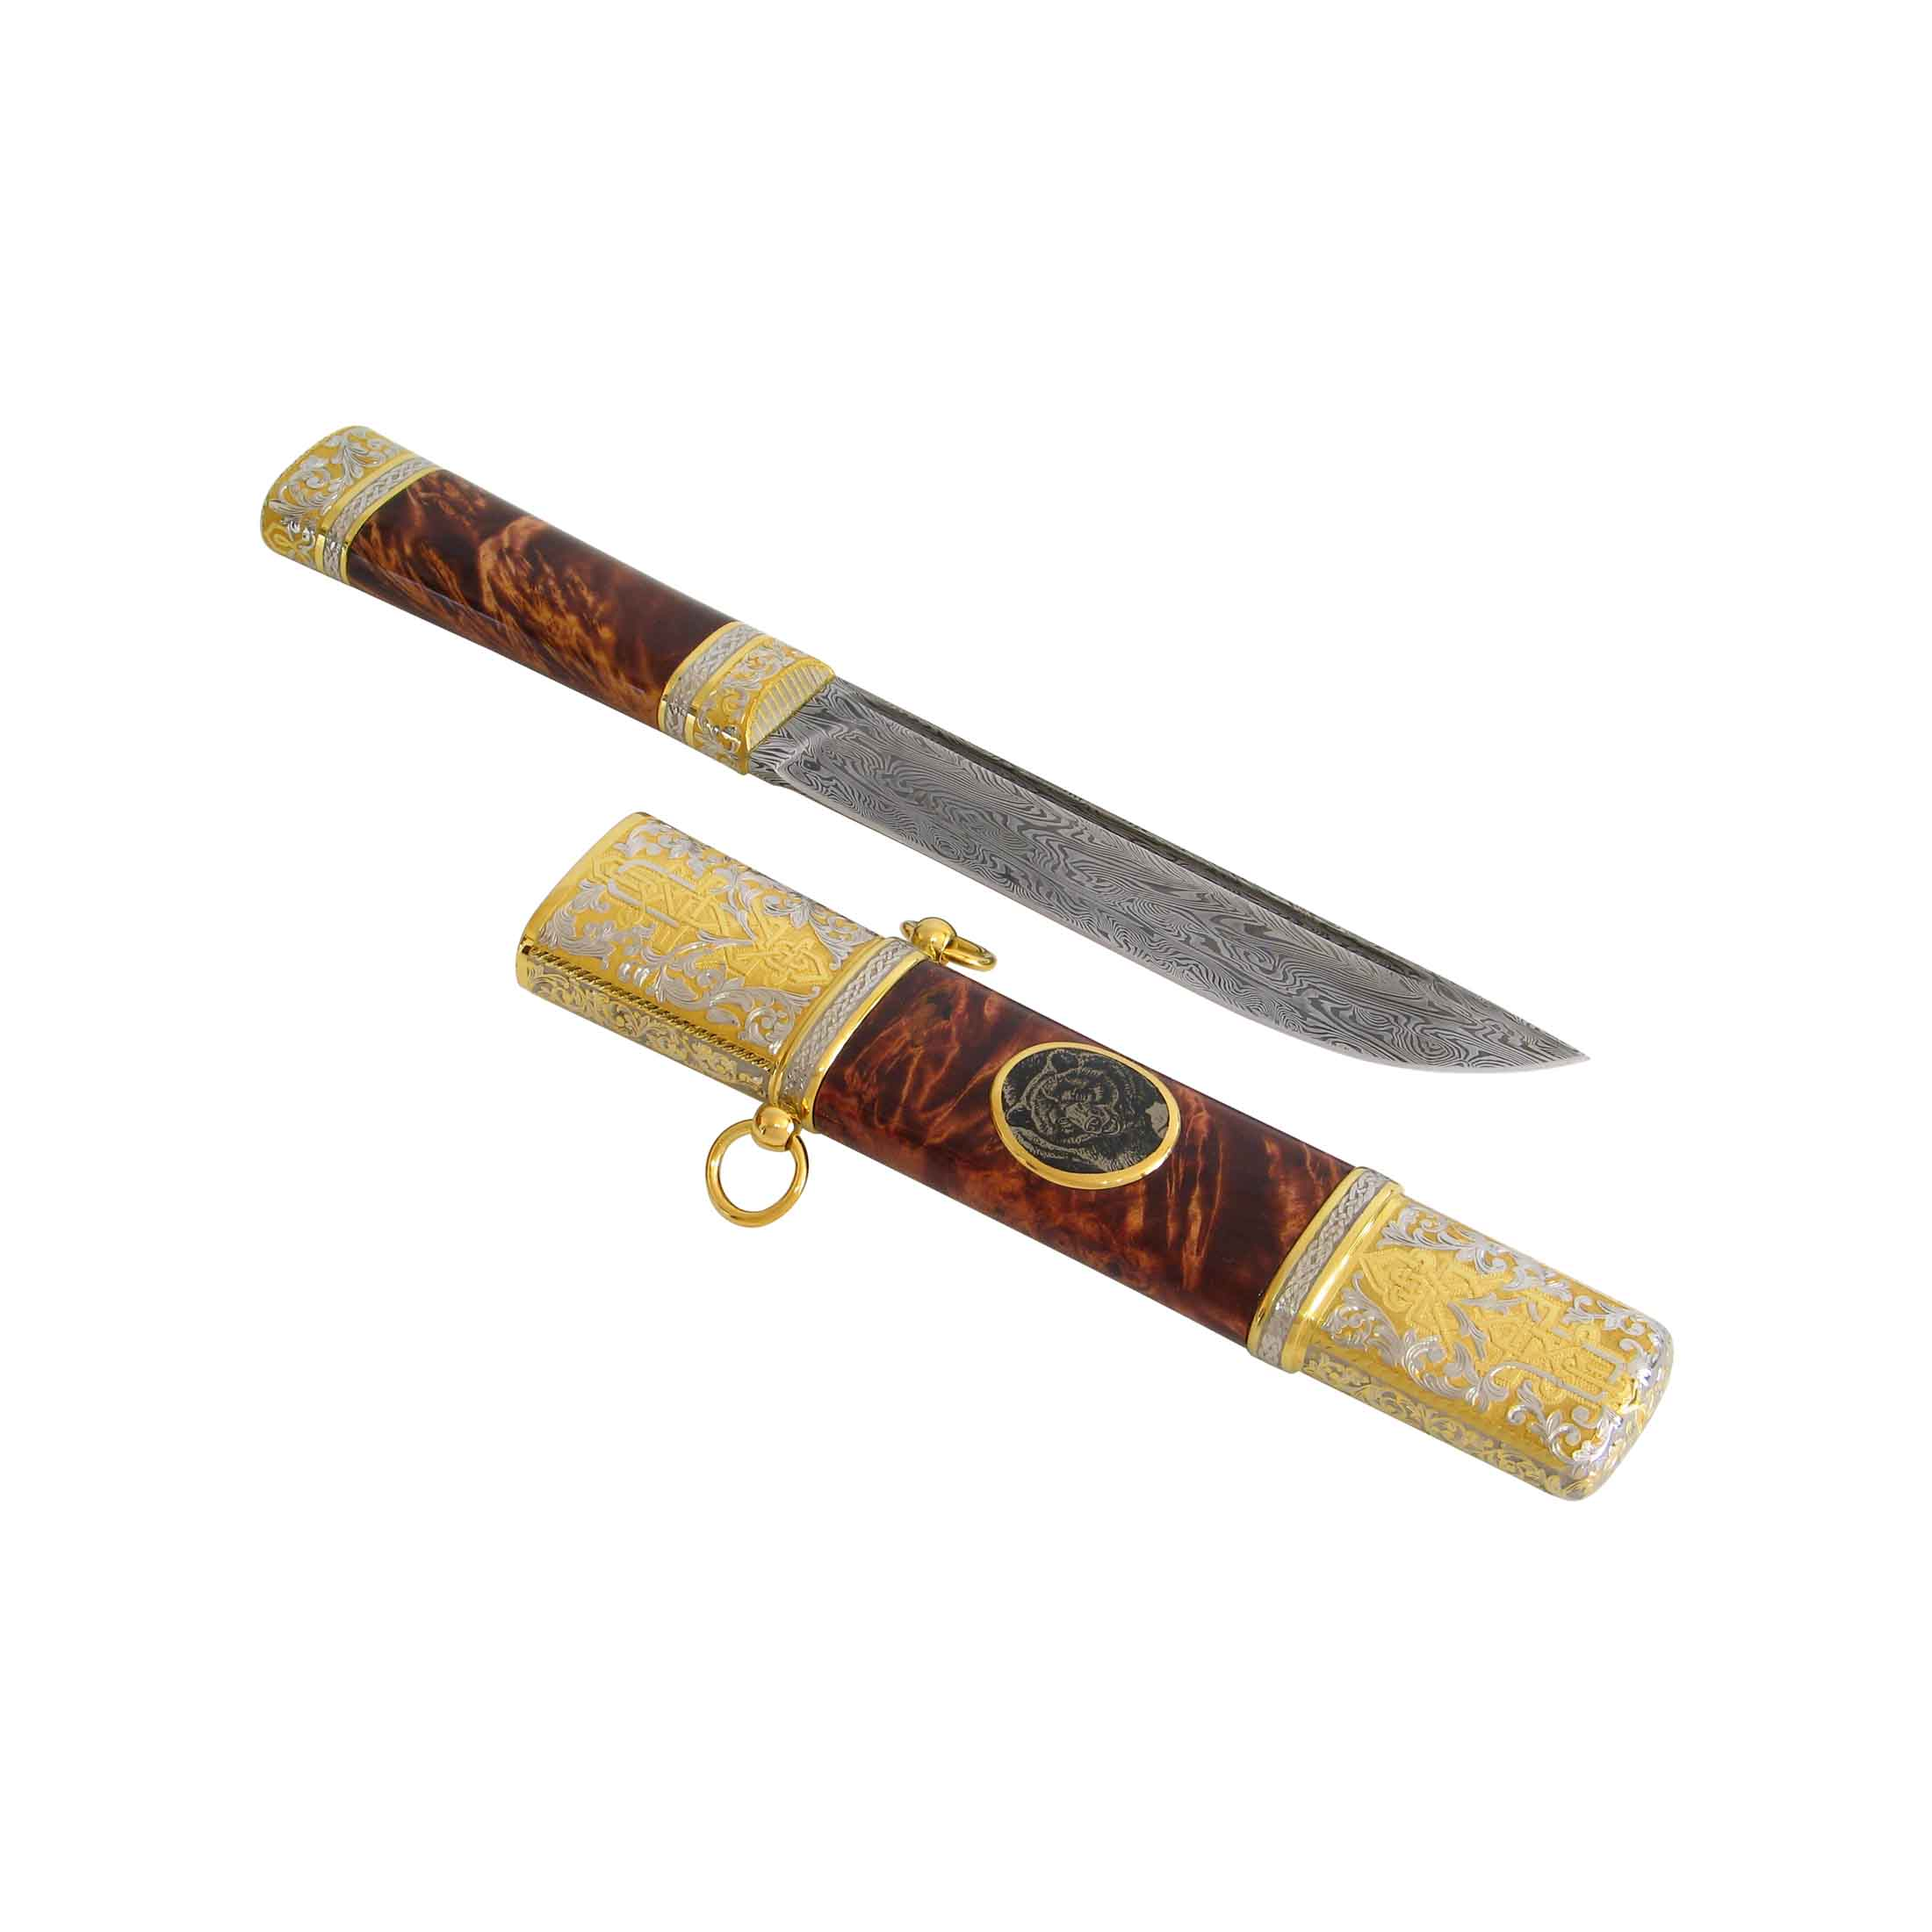 Нож в подарок мужчине фото